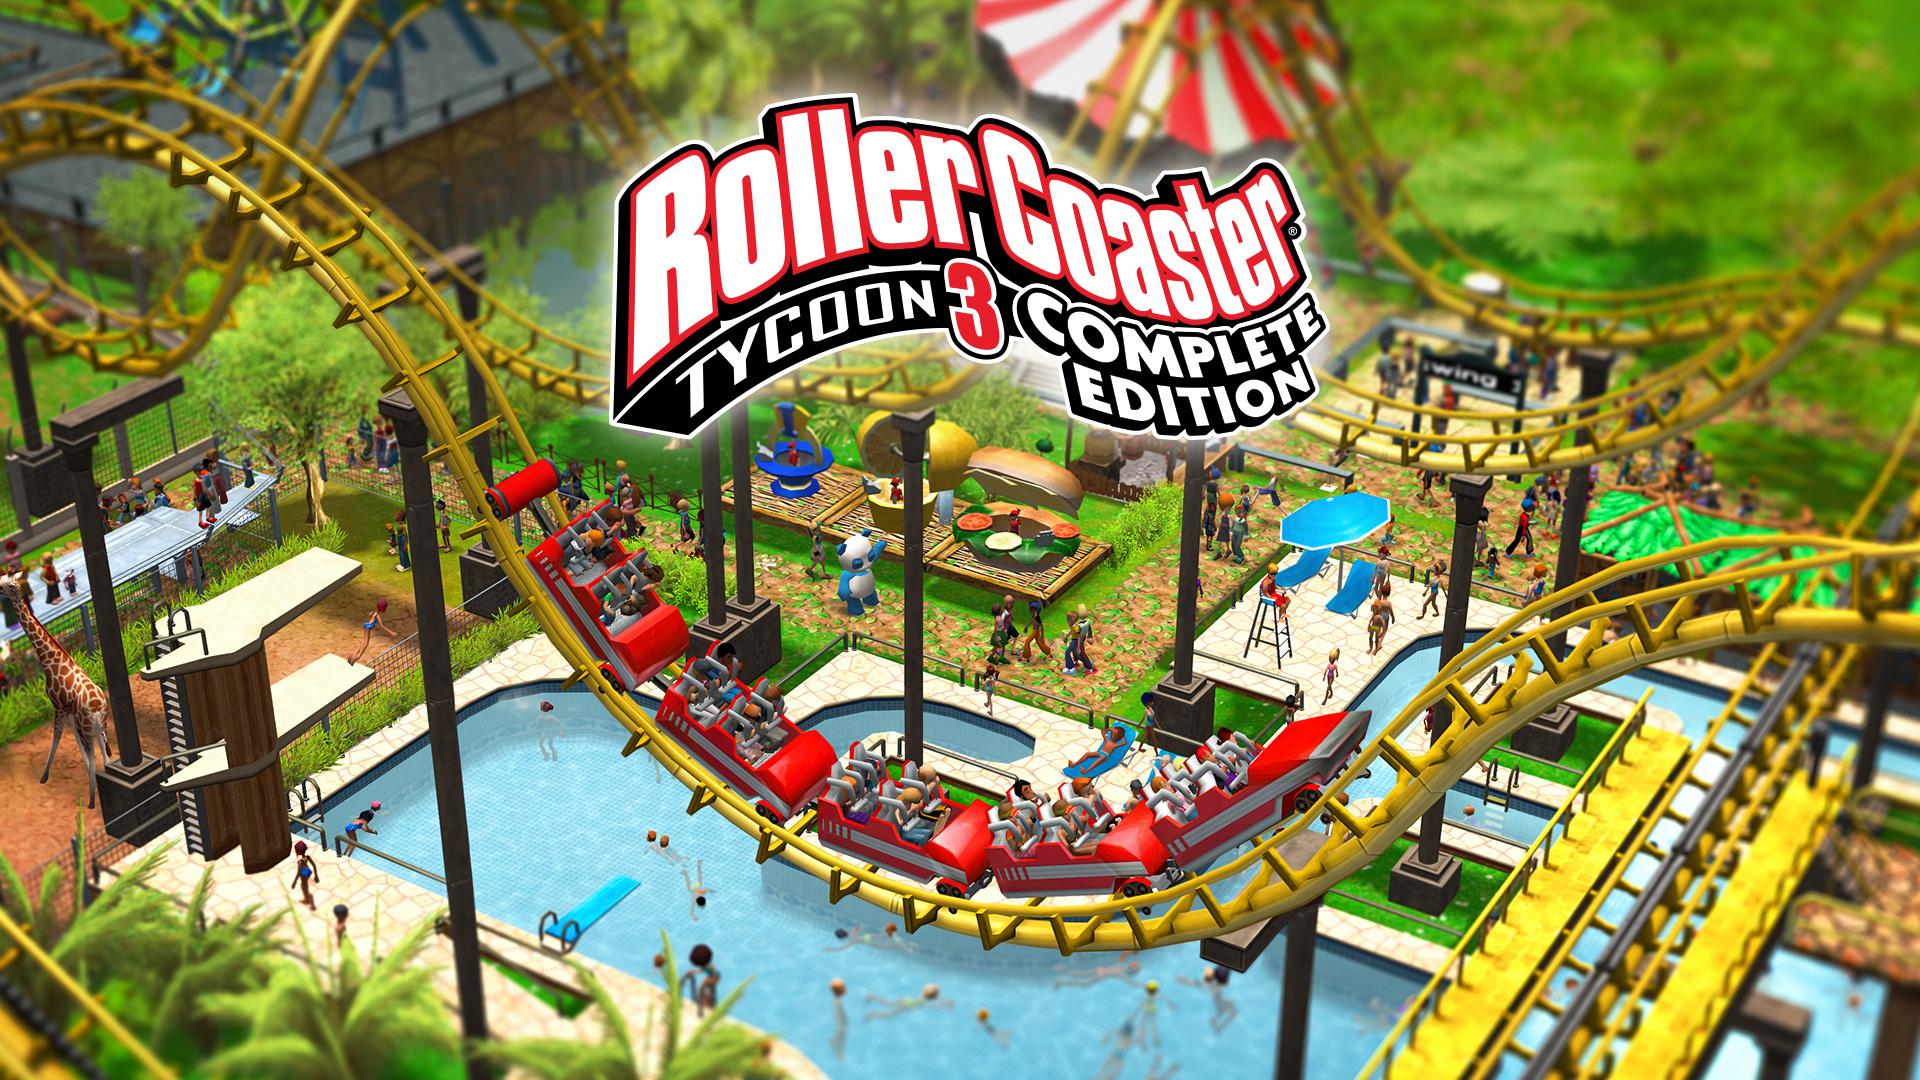 EGS_RollerCoasterTycoon3CompleteEdition_